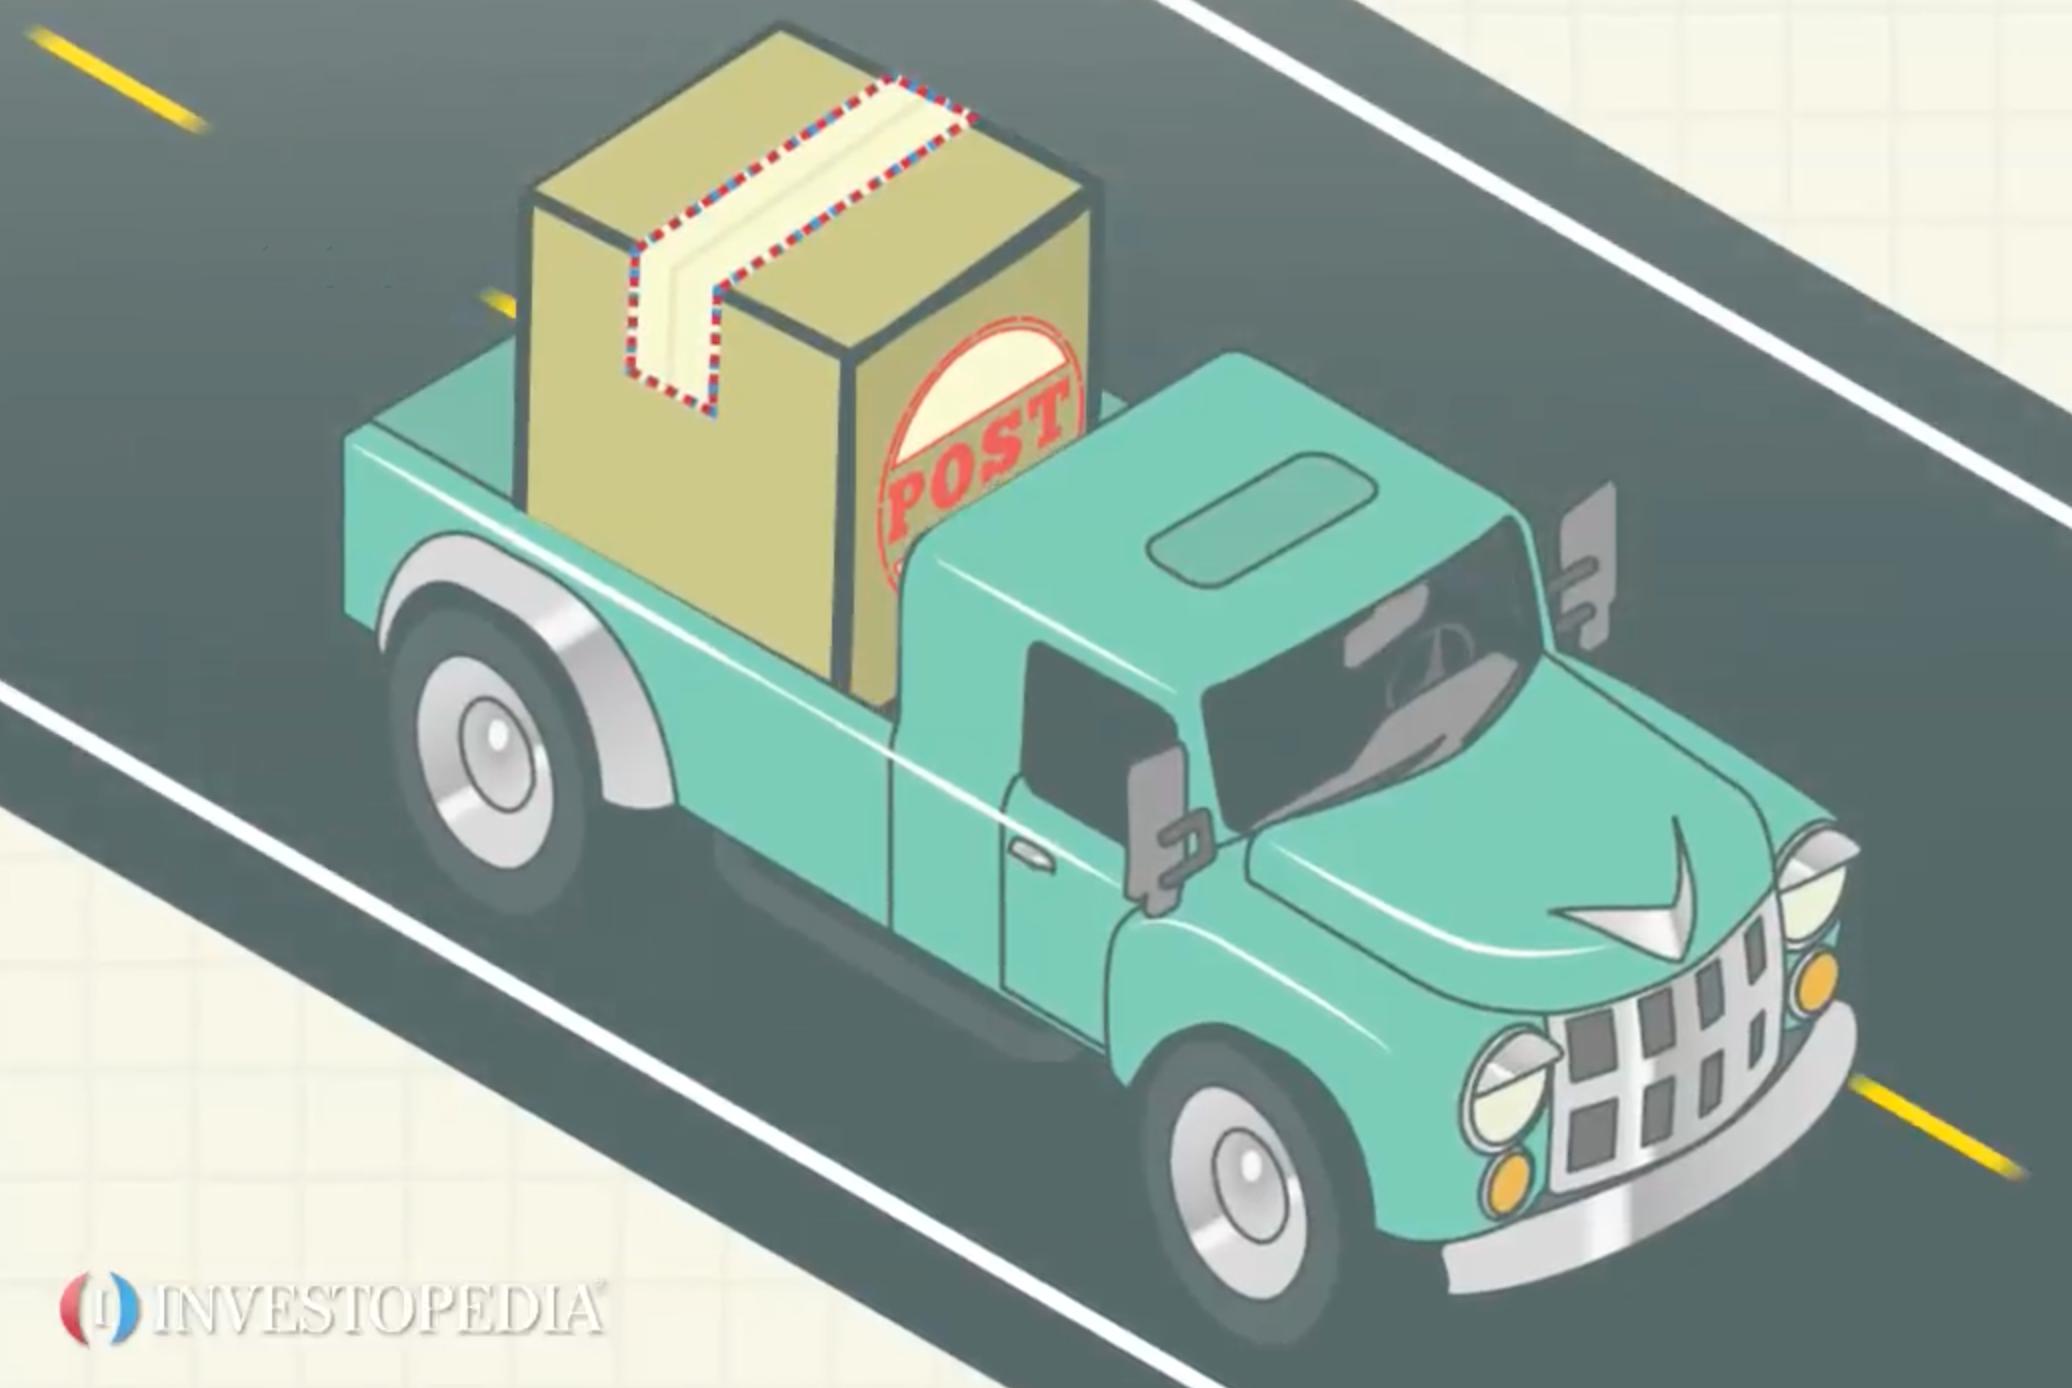 Cash On Delivery (COD) - Video   Investopedia